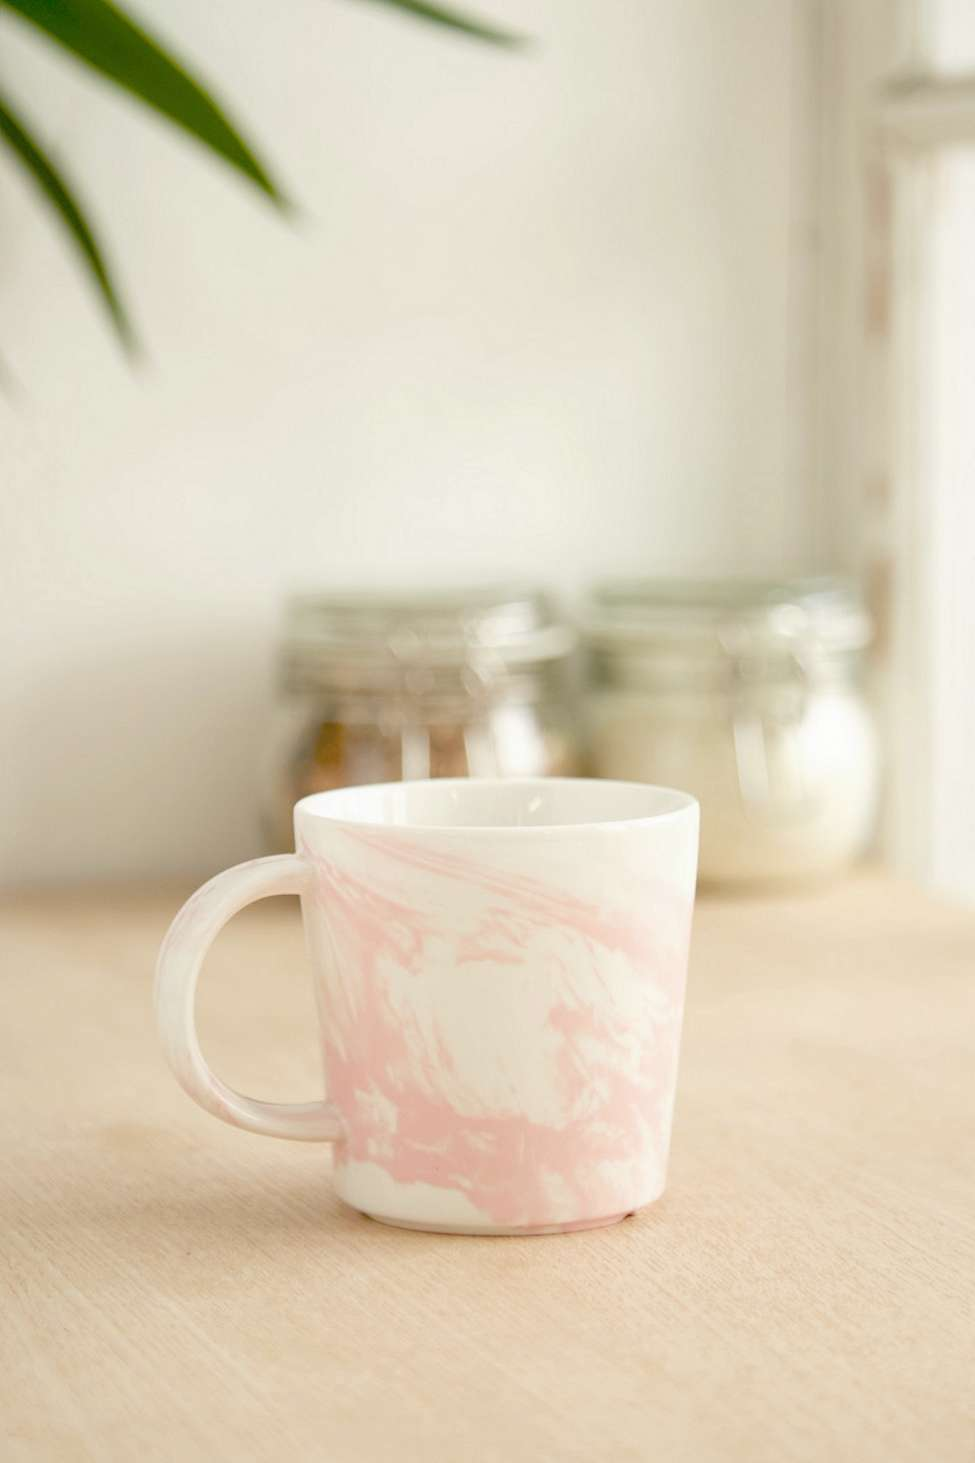 Slide View: 1: Marble Mug